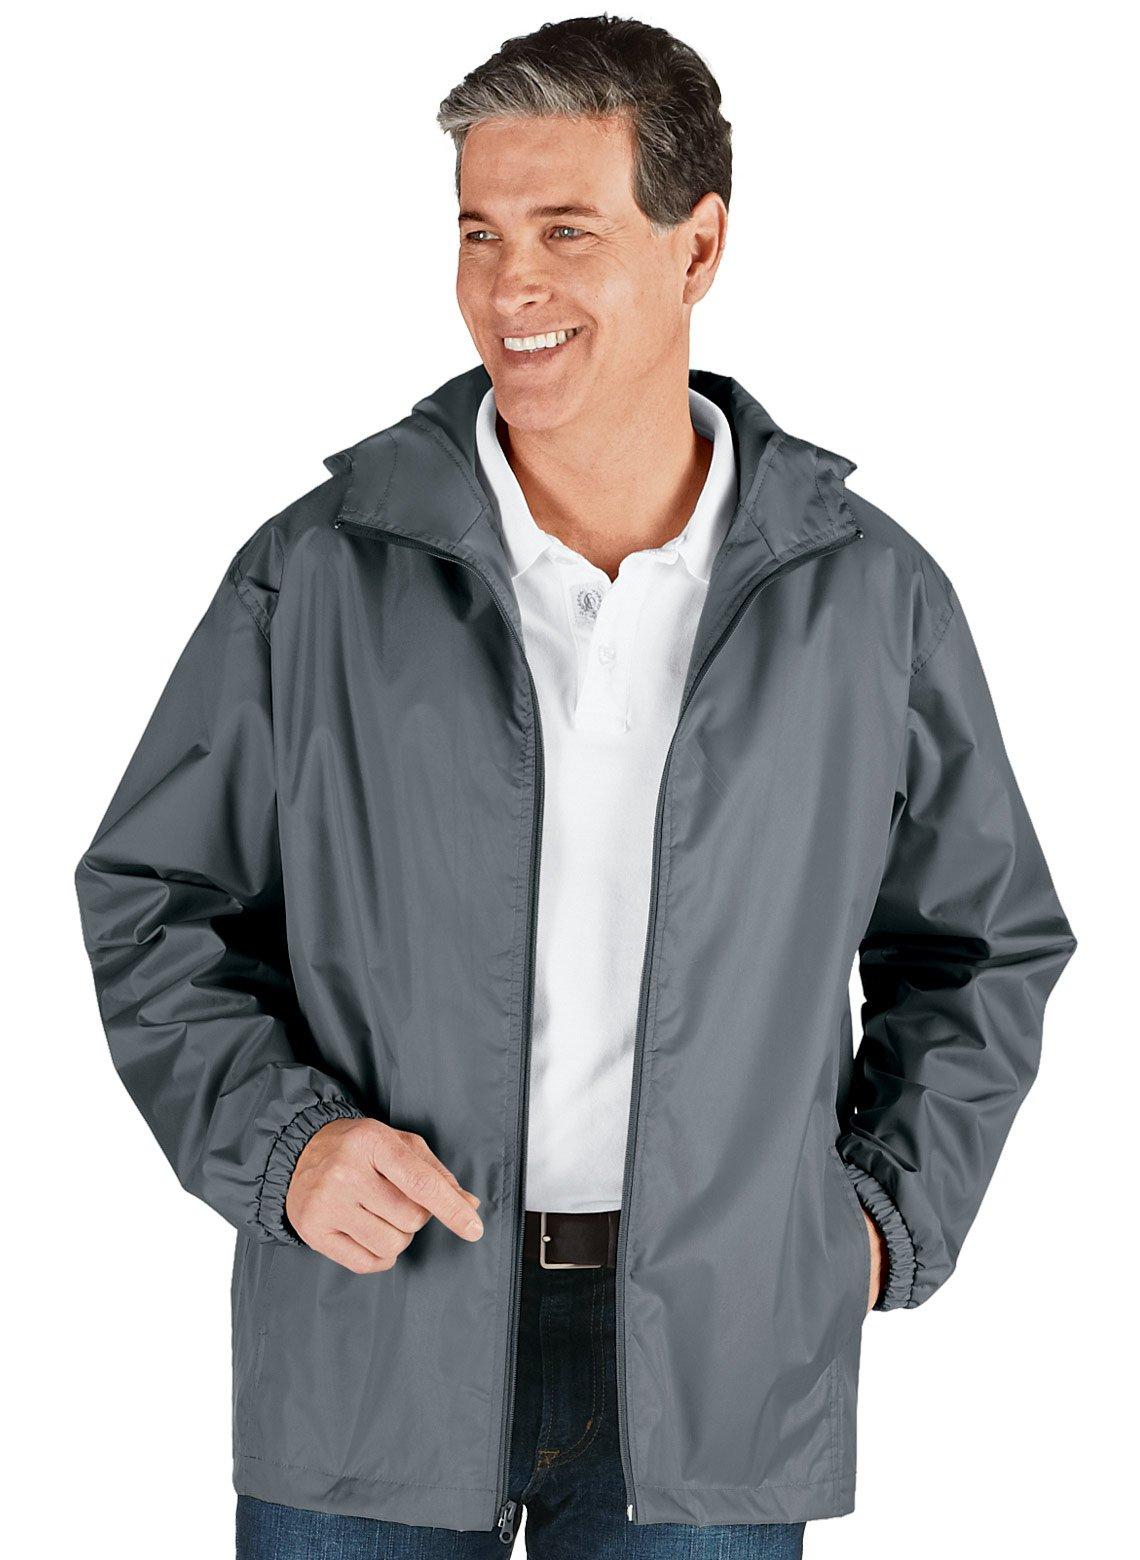 Carol Wright Gifts Lightweight Rain Jacket, Gray, Size Extra Large (3X)